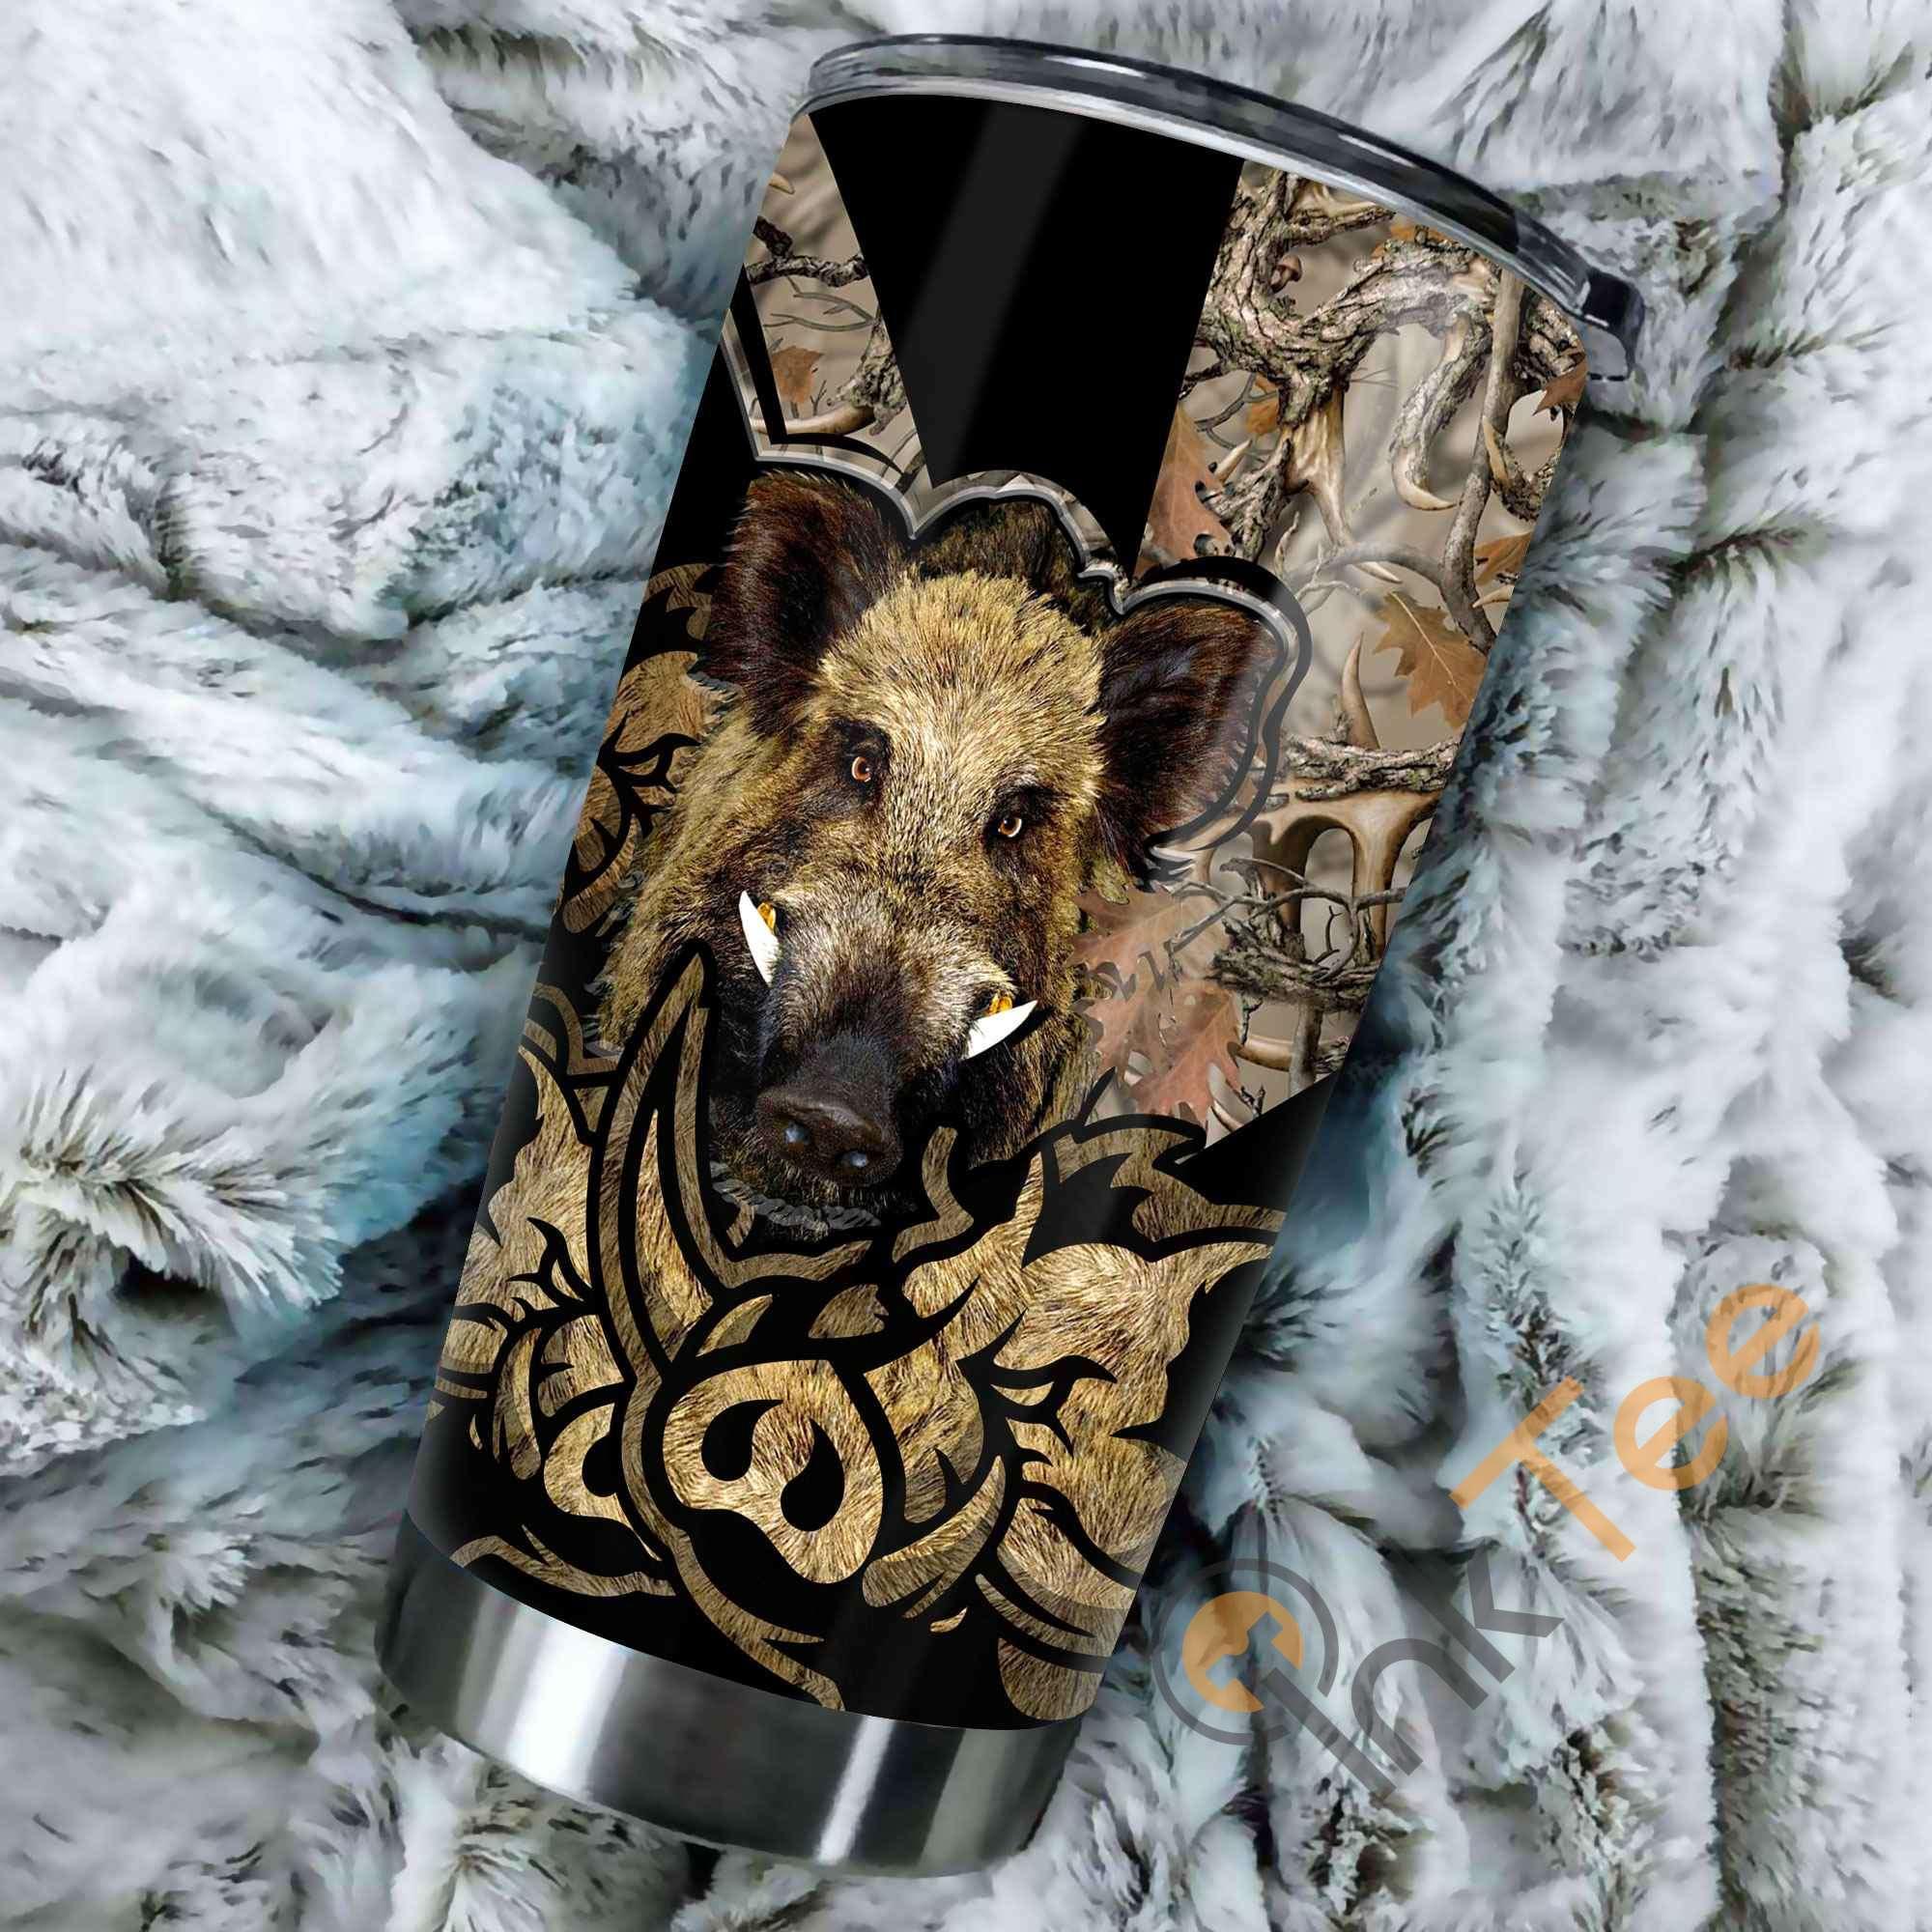 Boar Hunting Amazon Best Seller Sku 3647 Stainless Steel Tumbler